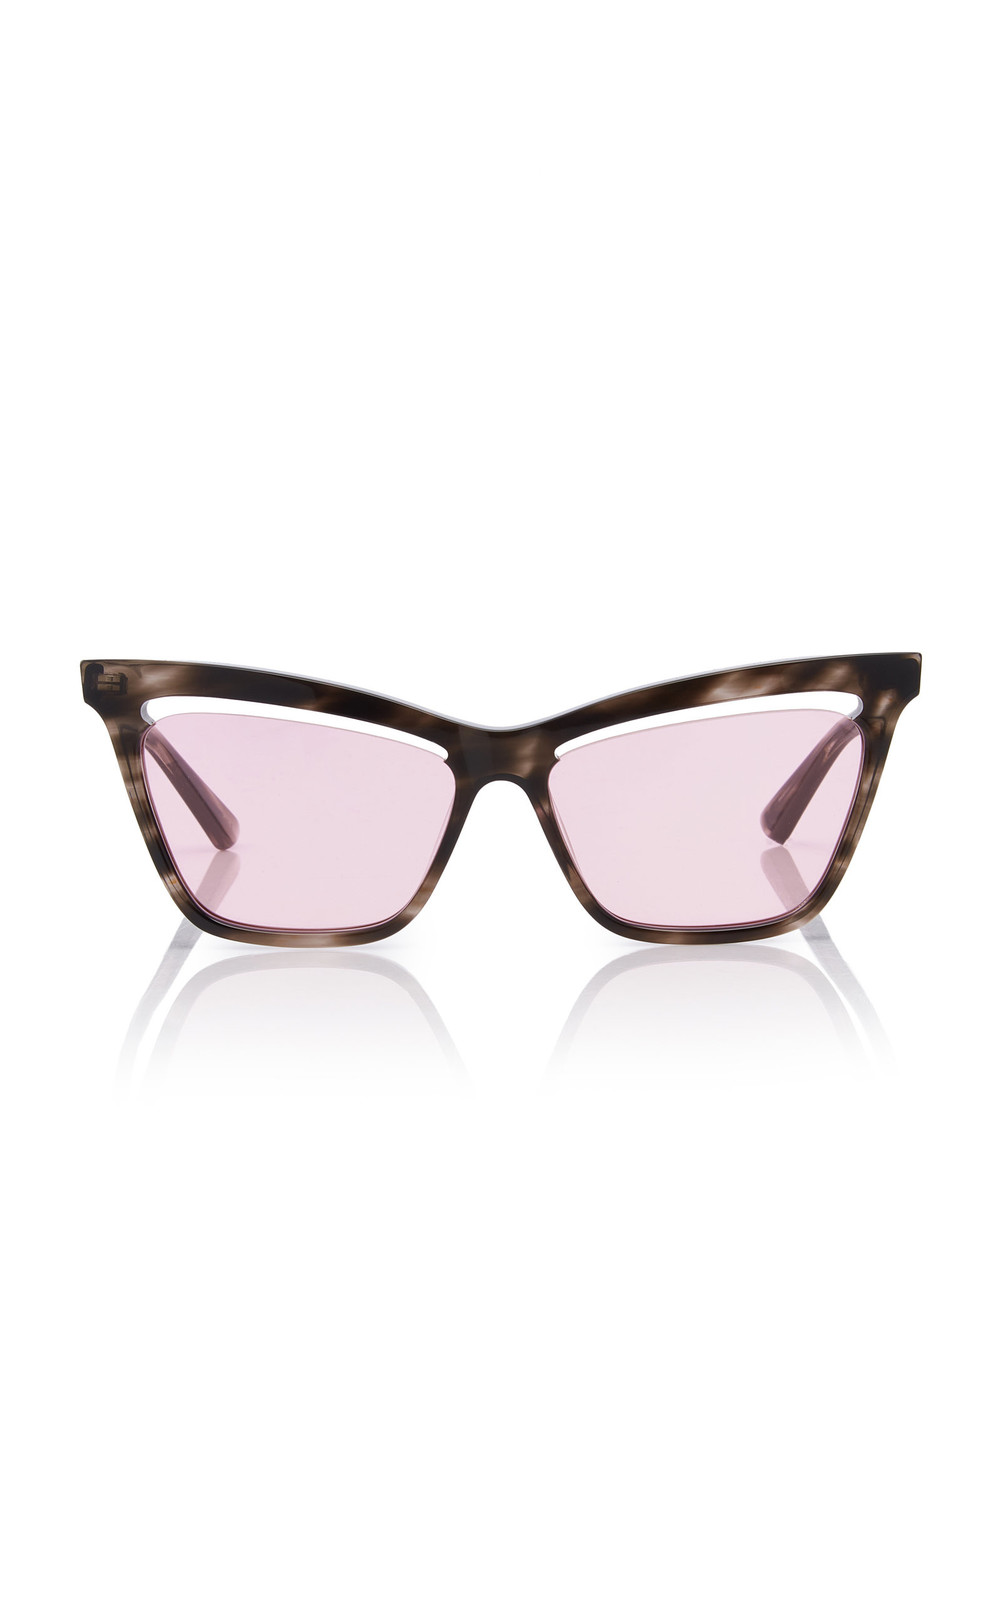 MCQ Sunglasses Angular Acetate Cat-Eye Sunglasses in pink